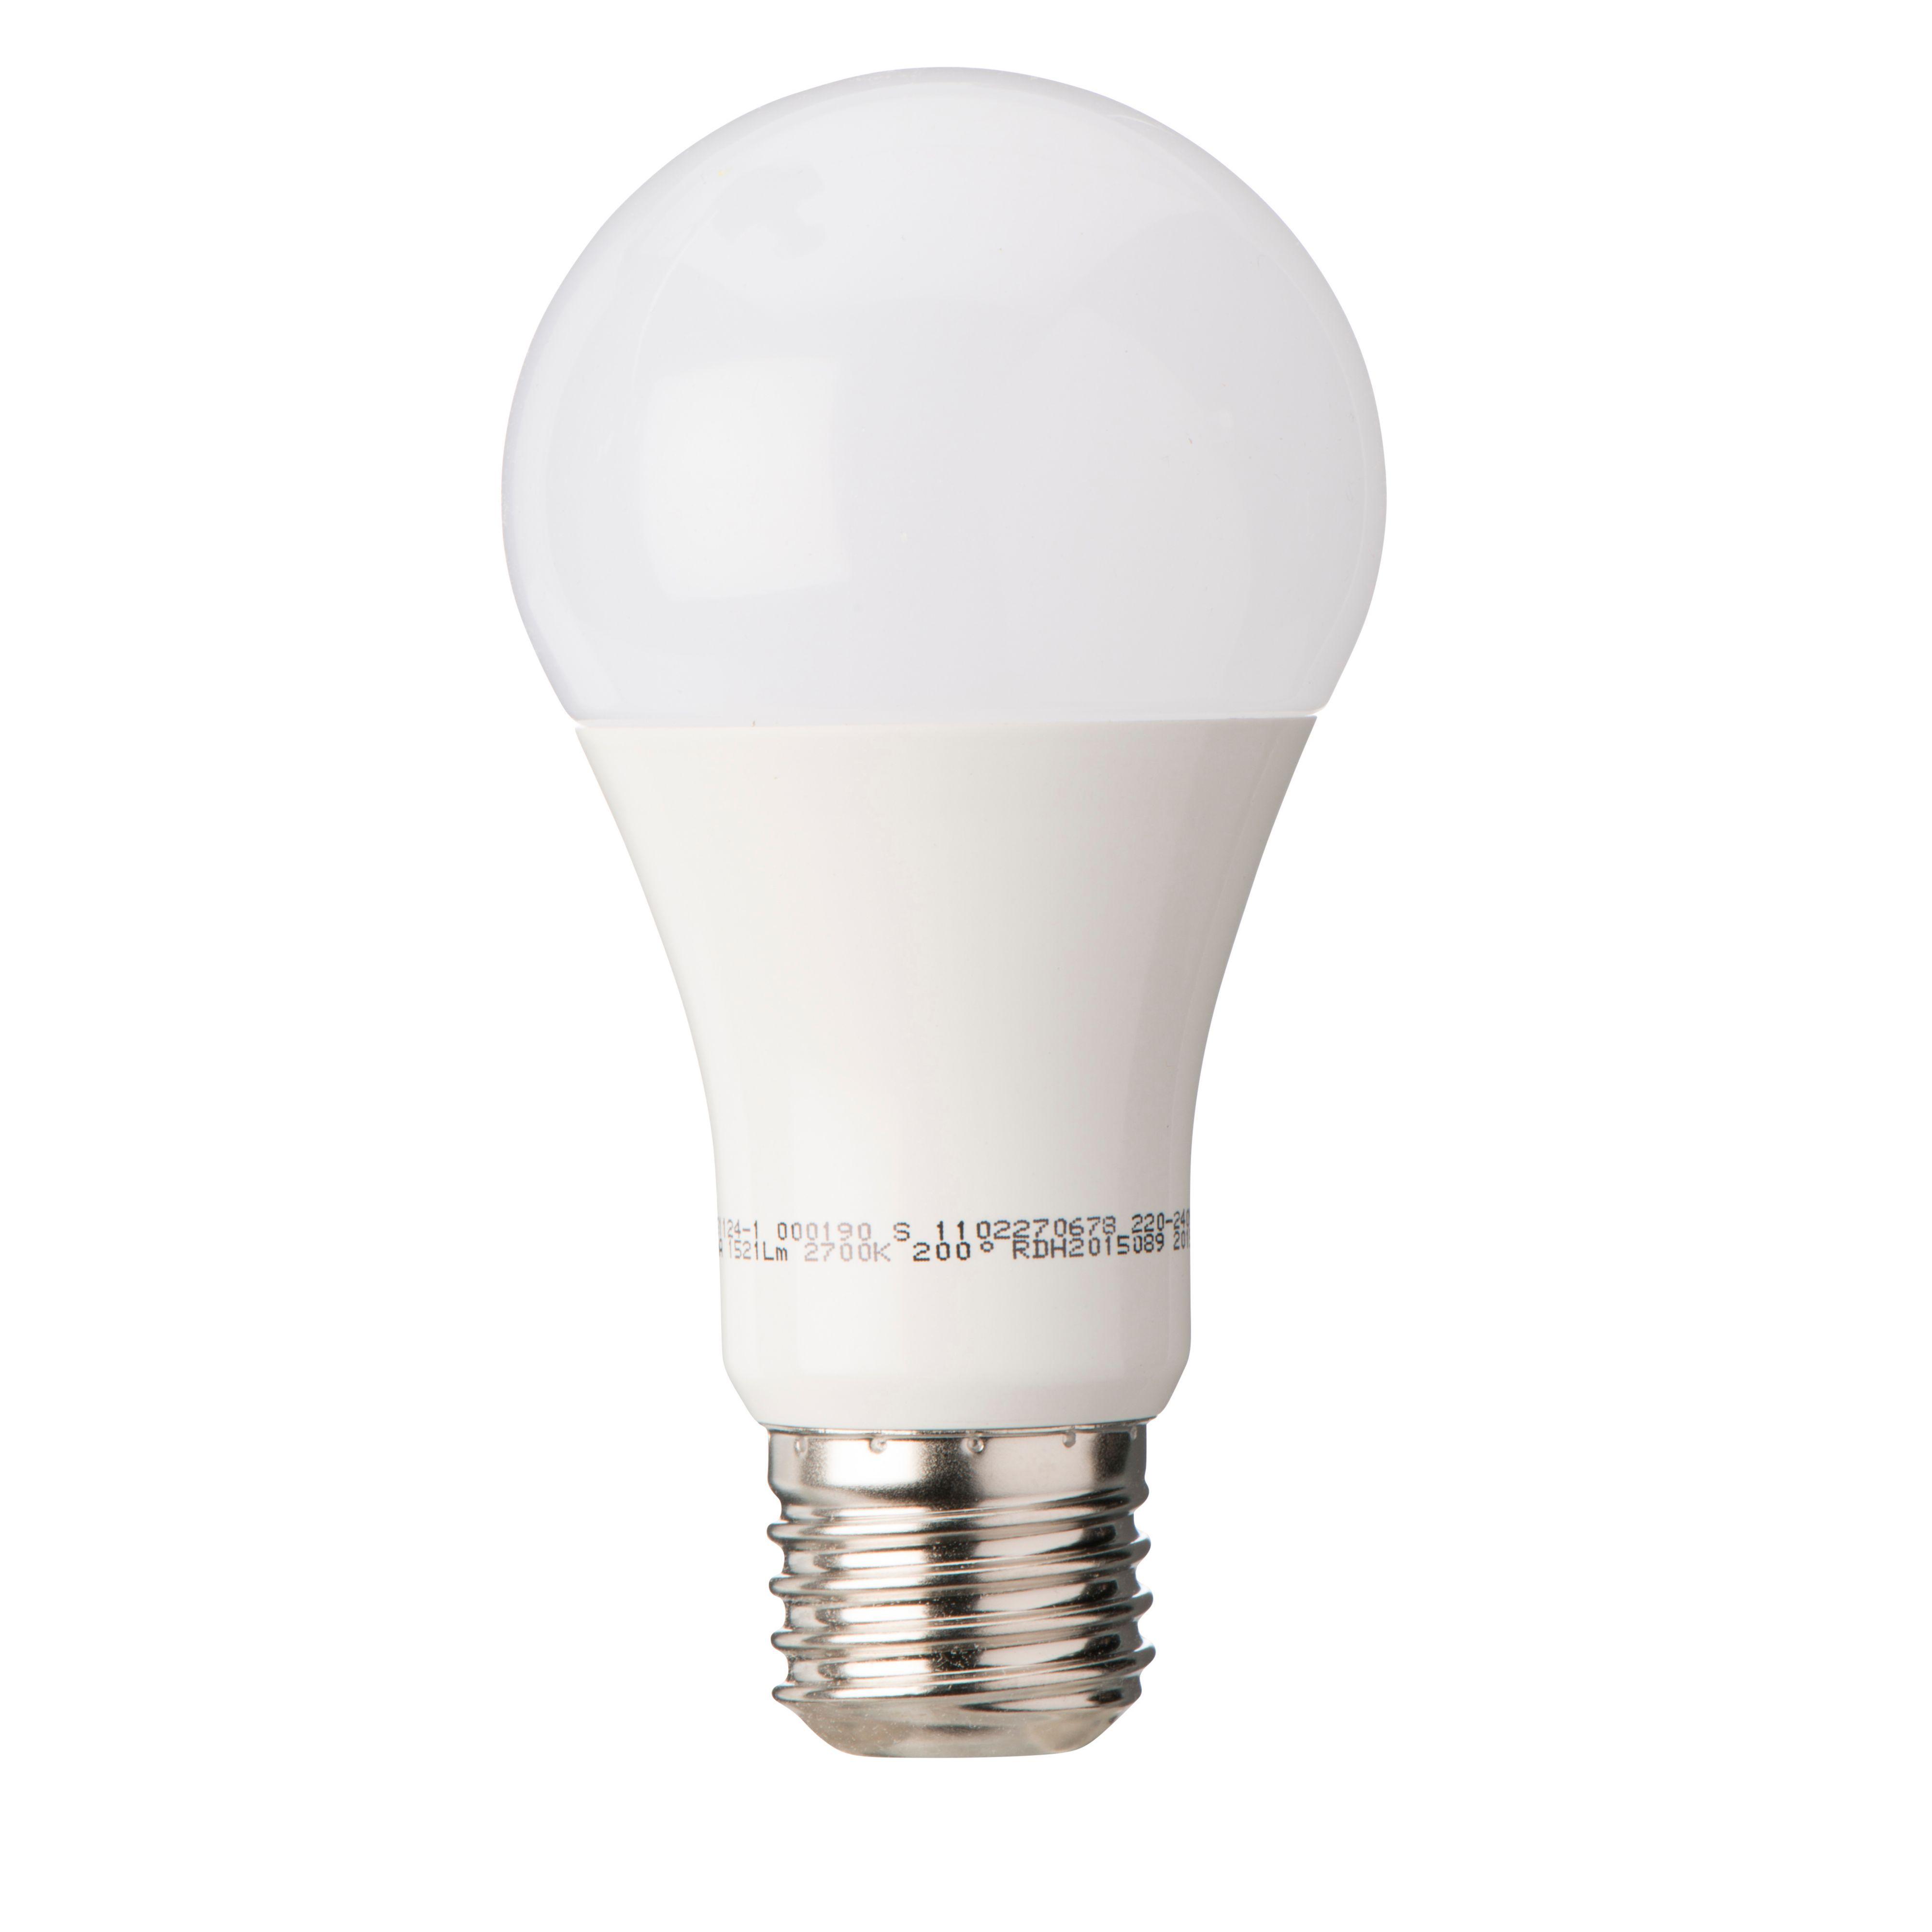 Diall E27 1521lm LED Classic Light Bulb